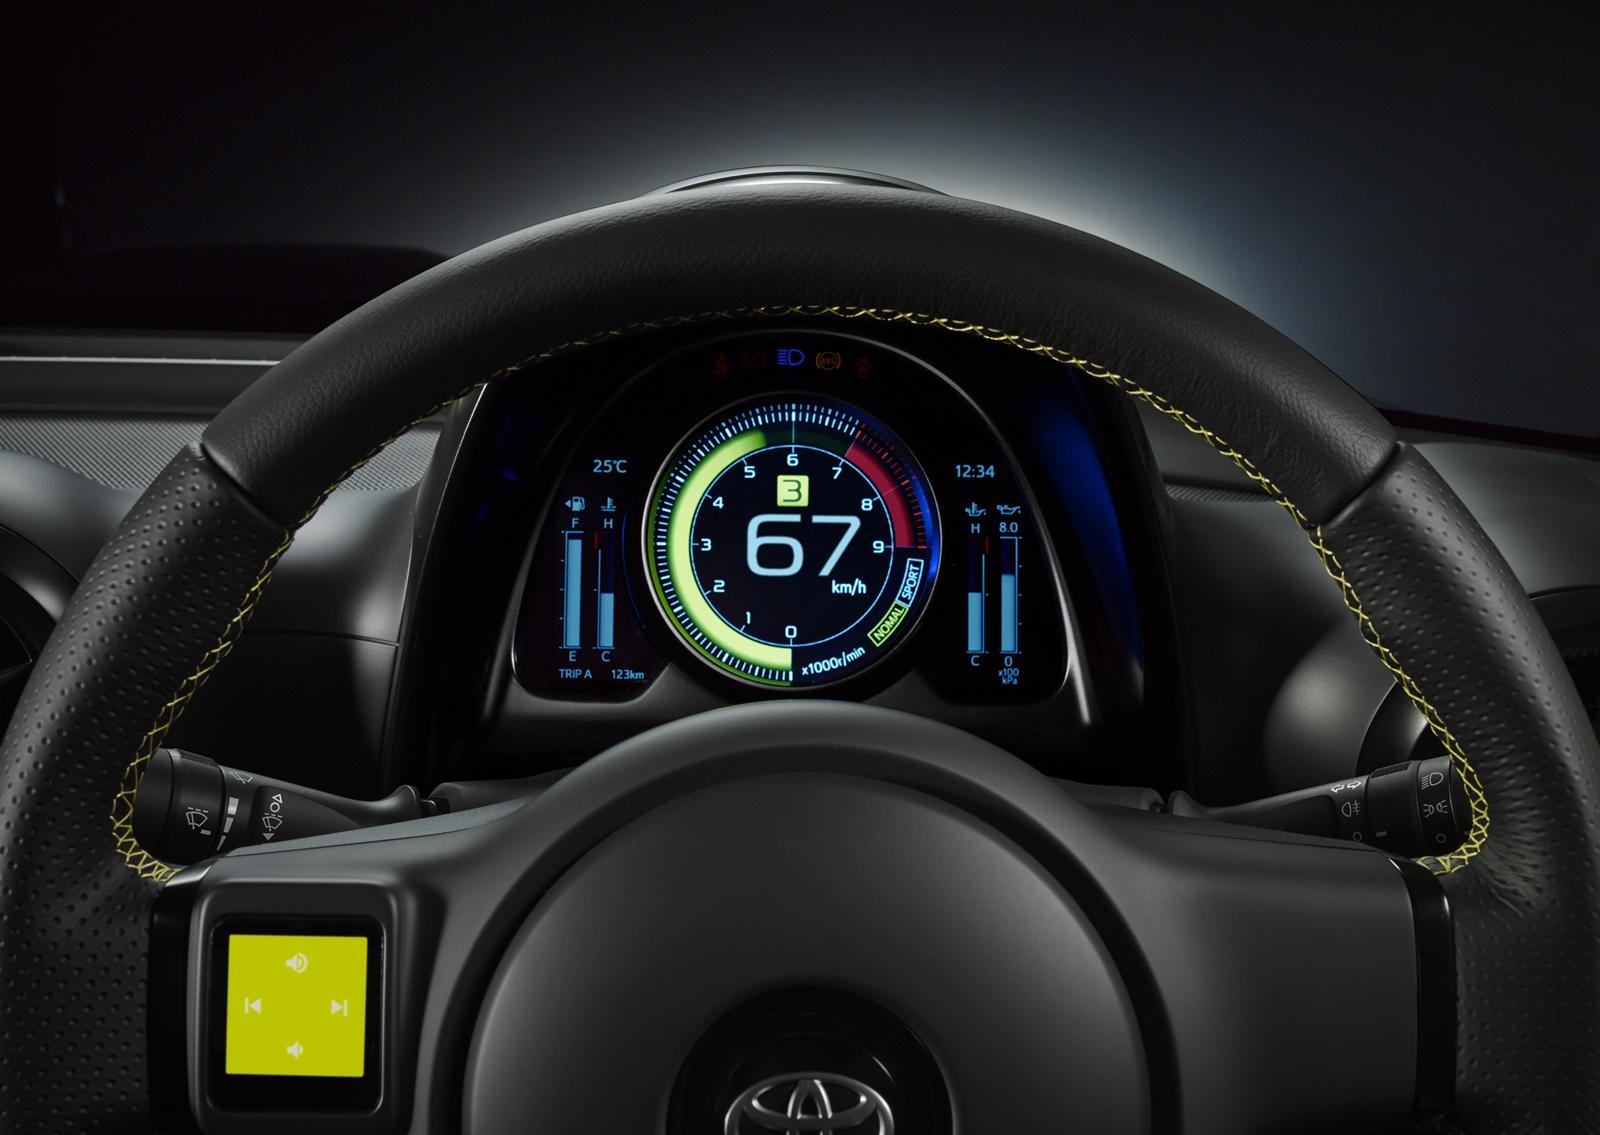 [Image: S0-Tokyo-2015-Toyota-devoile-le-S-FR-Concept-363934.jpg]